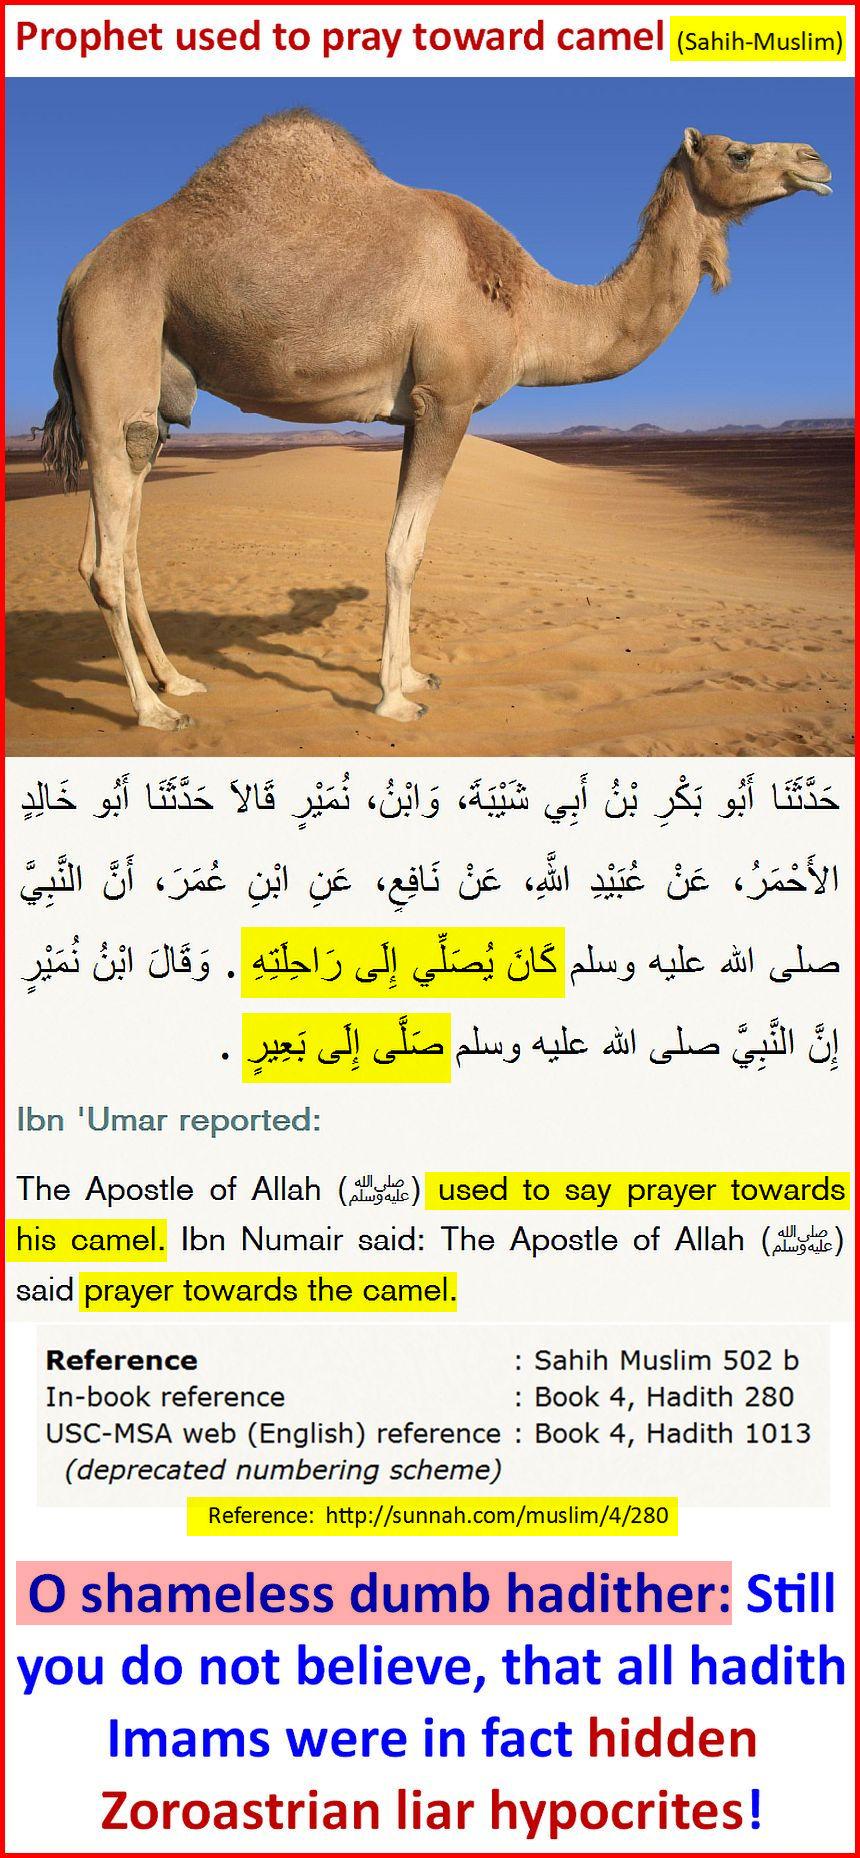 PrayingTowardCamel